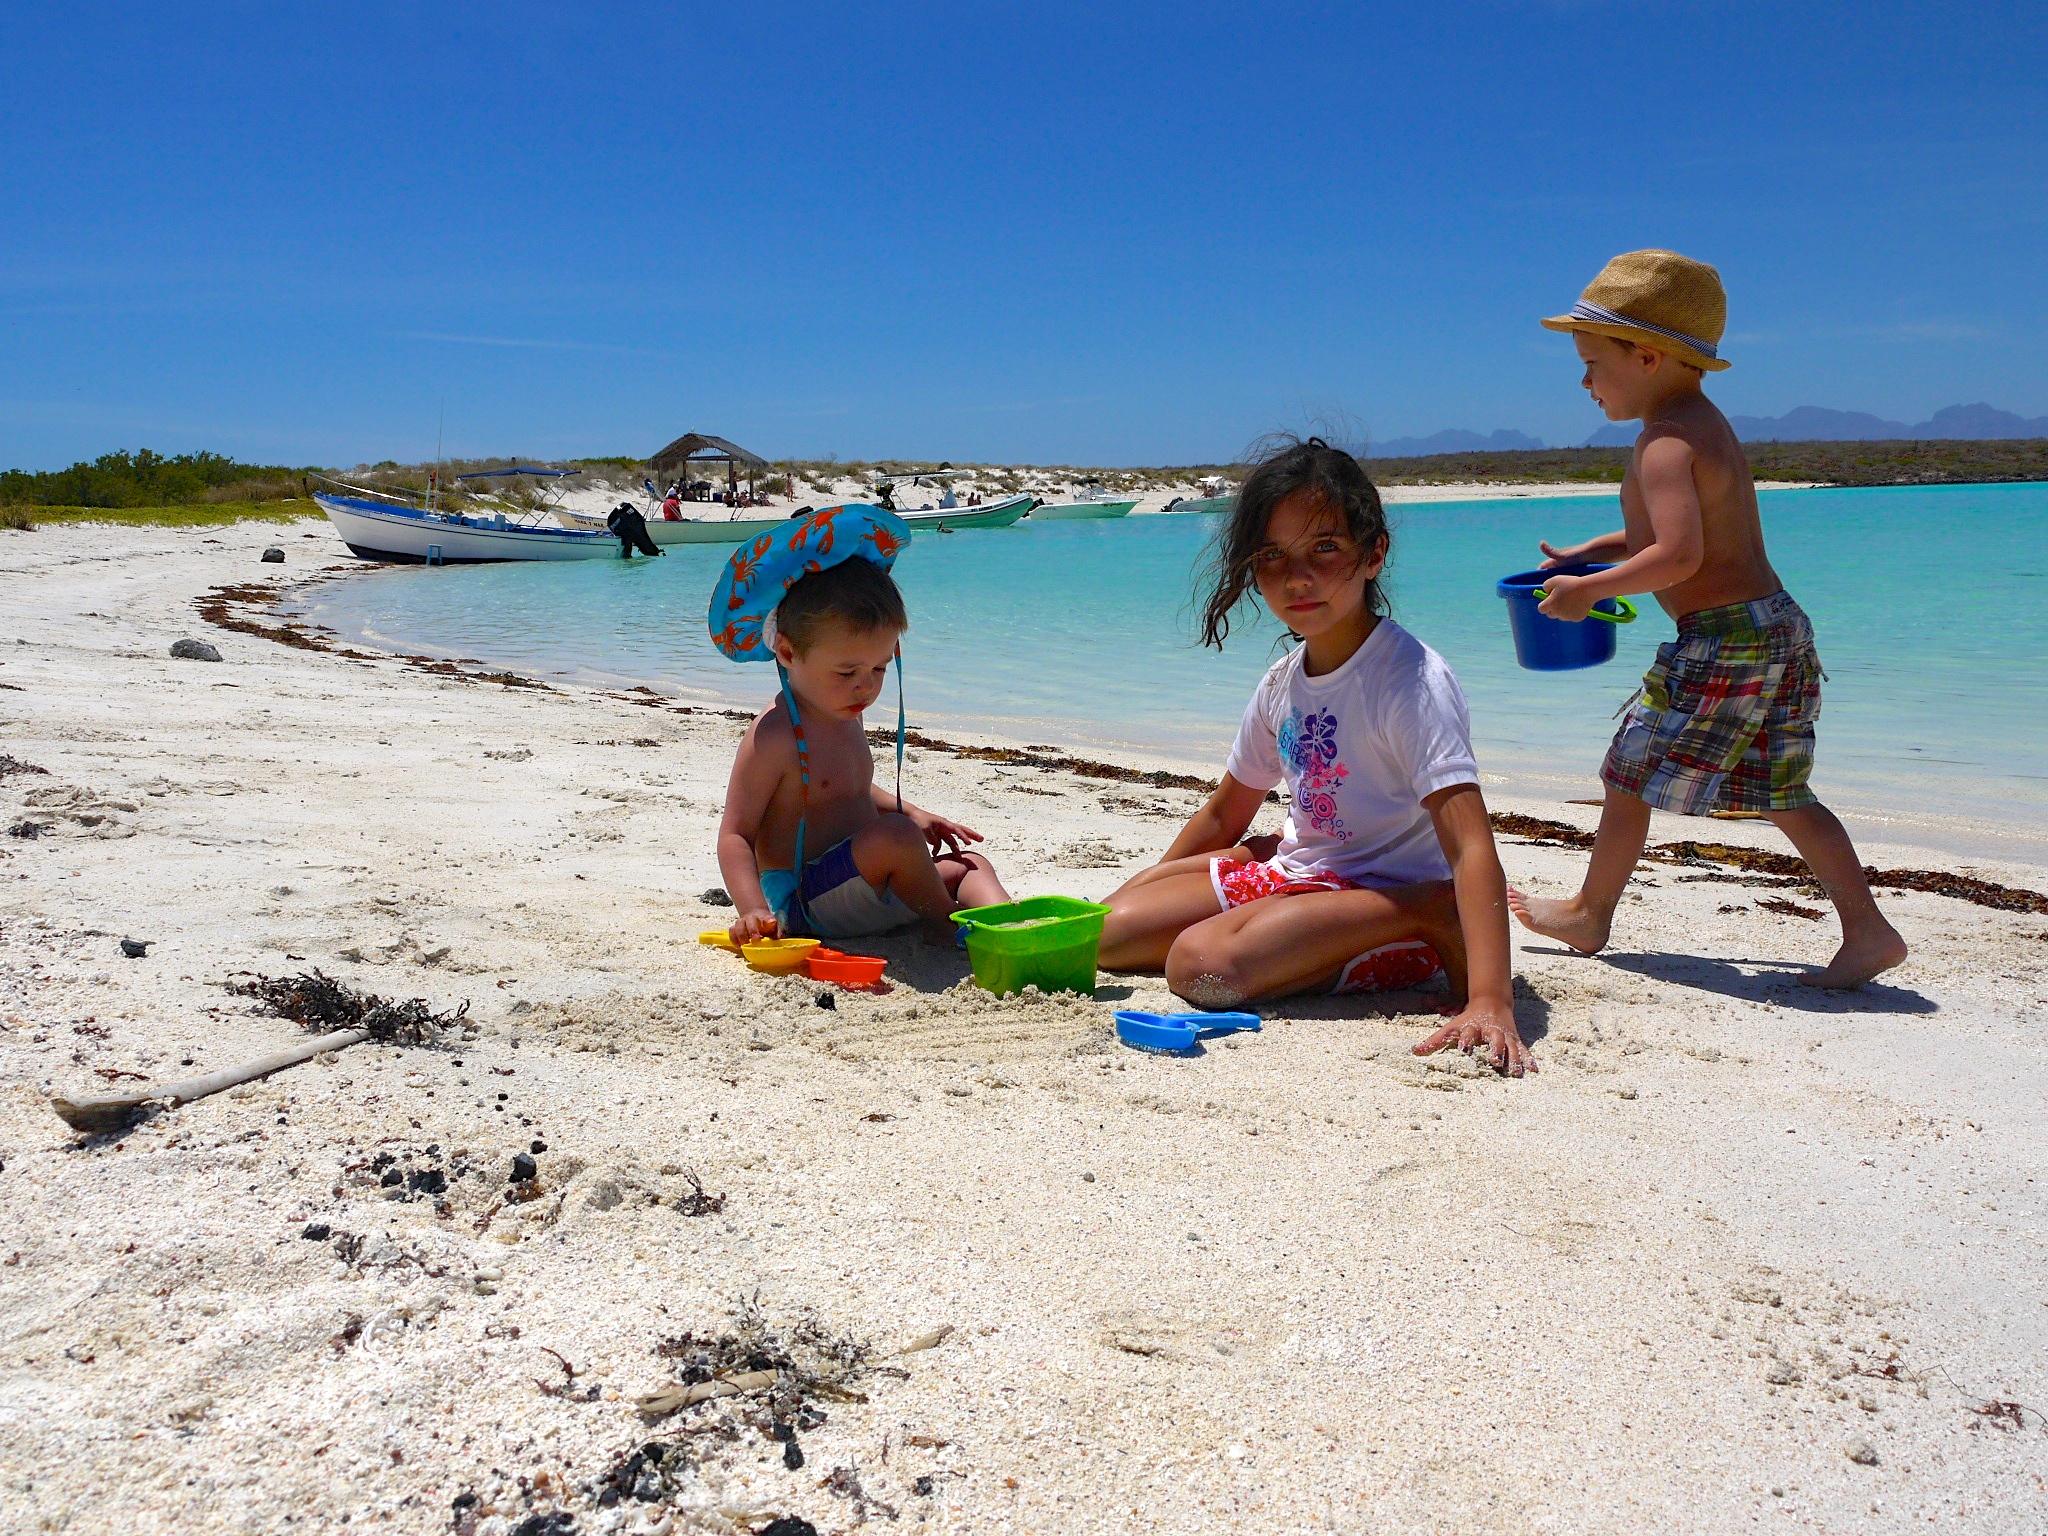 Everett (and his goofy sun hat), Madeline, and Elliott hard at work building castles on Coronado Island.